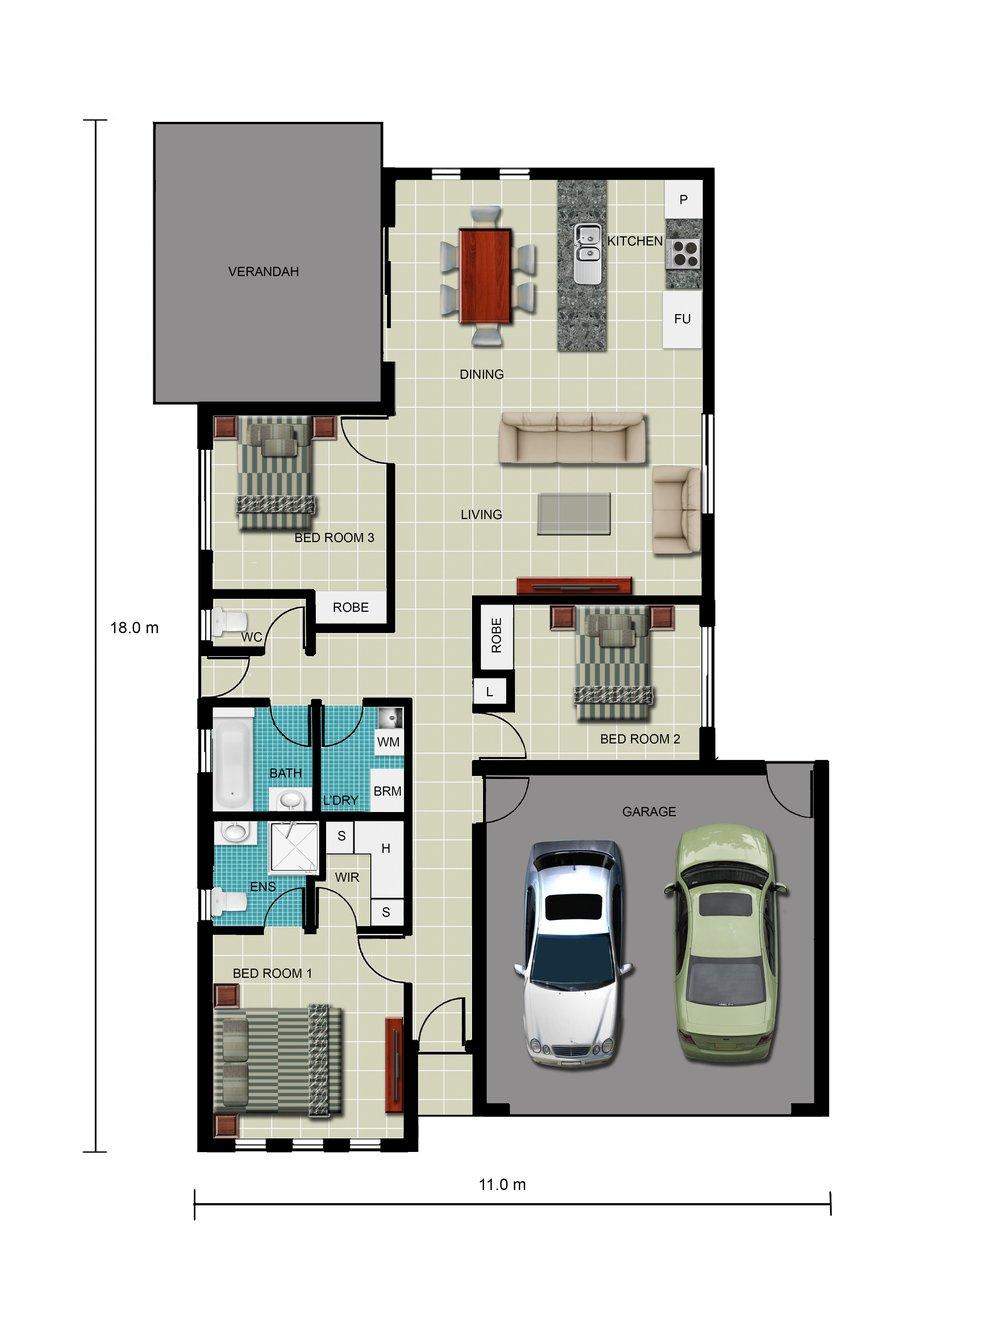 Kimberly 208-B FP Web Image.jpg